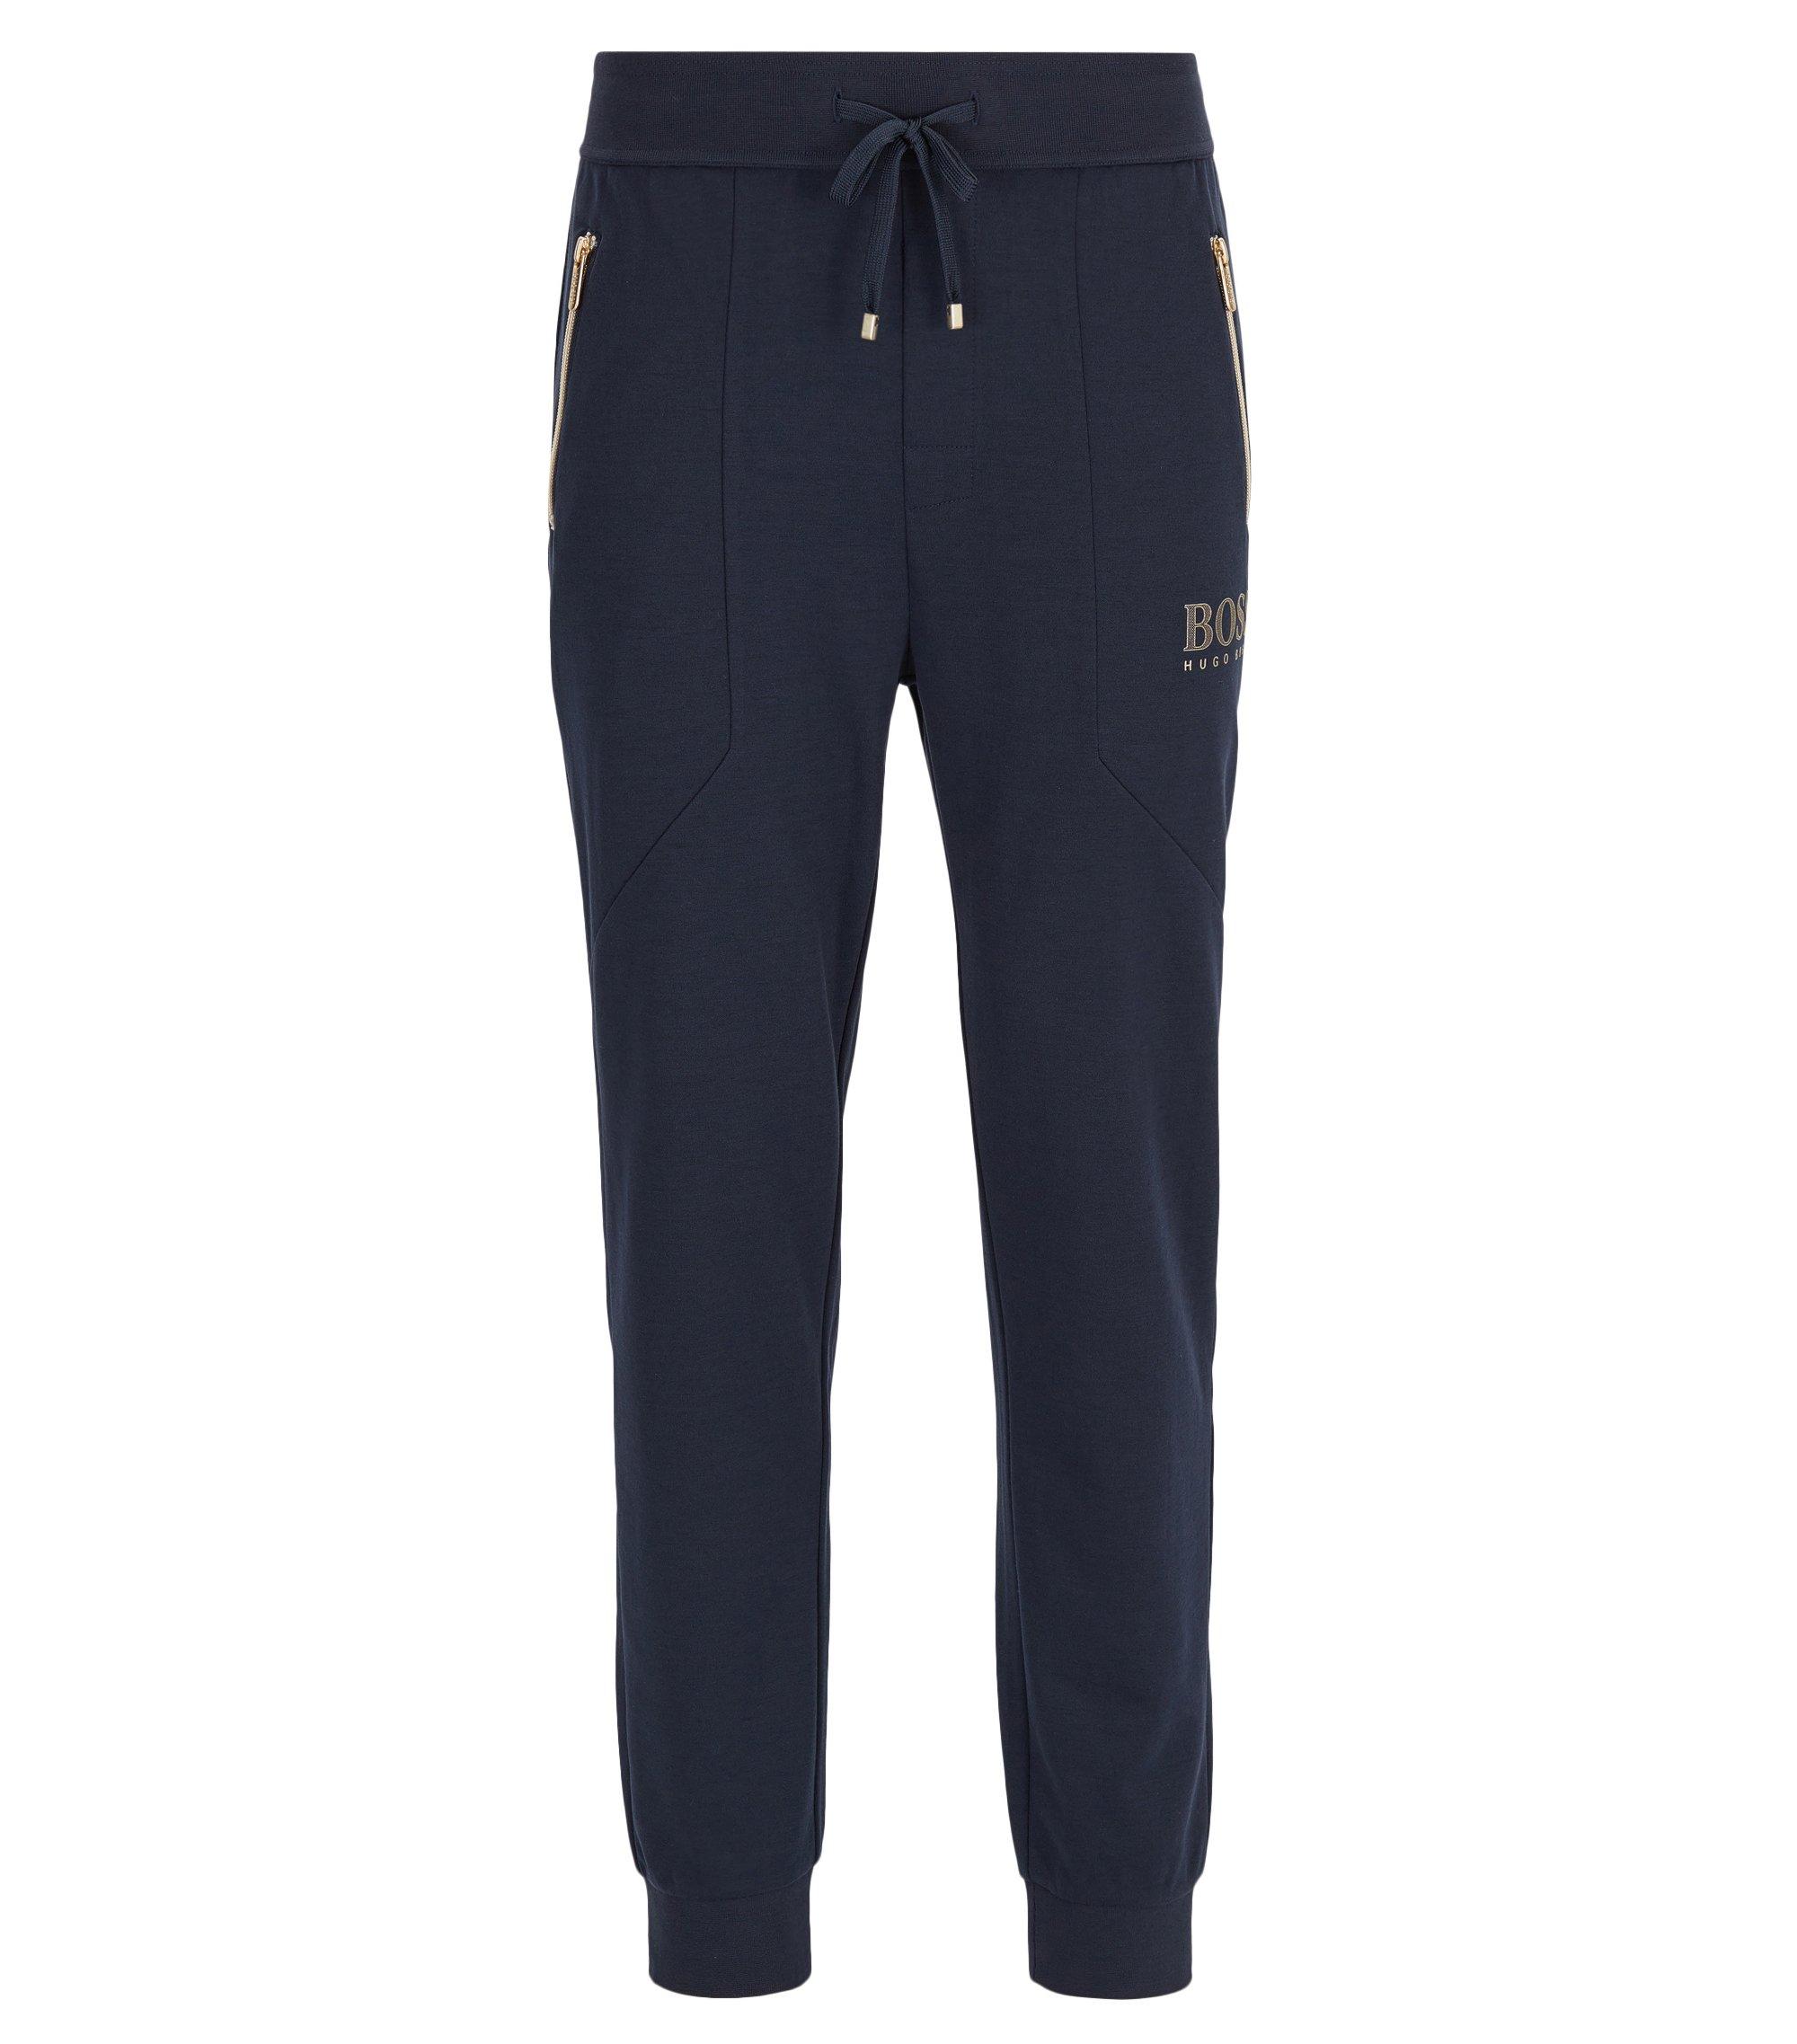 Pantalones loungewear en mezcla de algodón, Azul oscuro